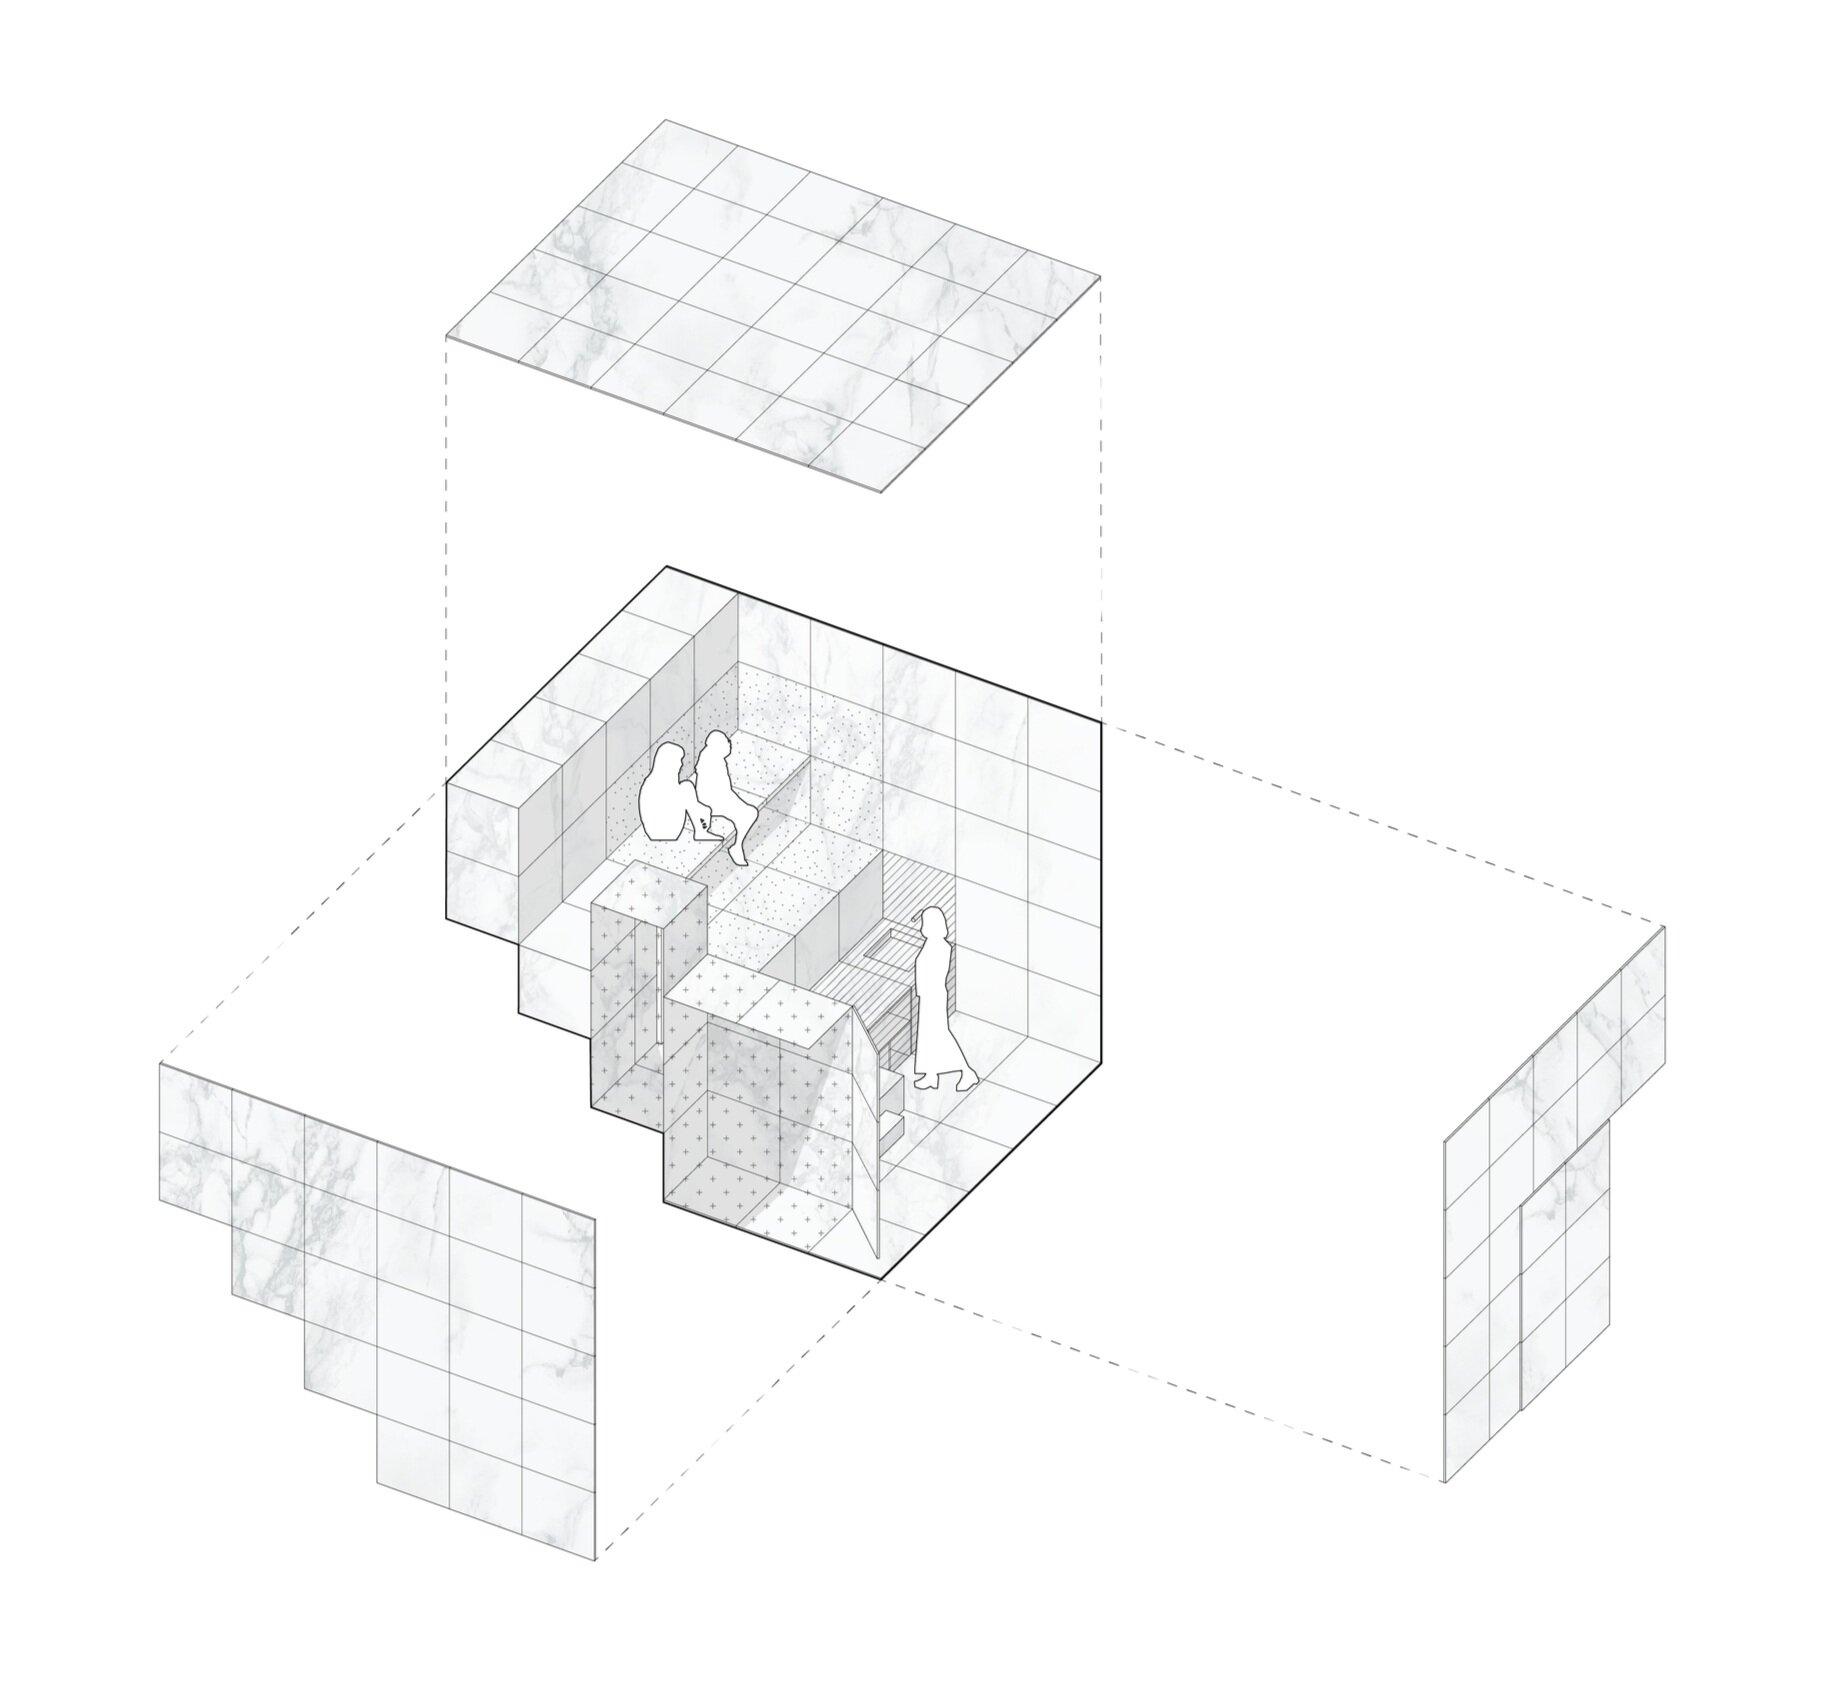 20190417_02_Stair_Cube-01.jpg